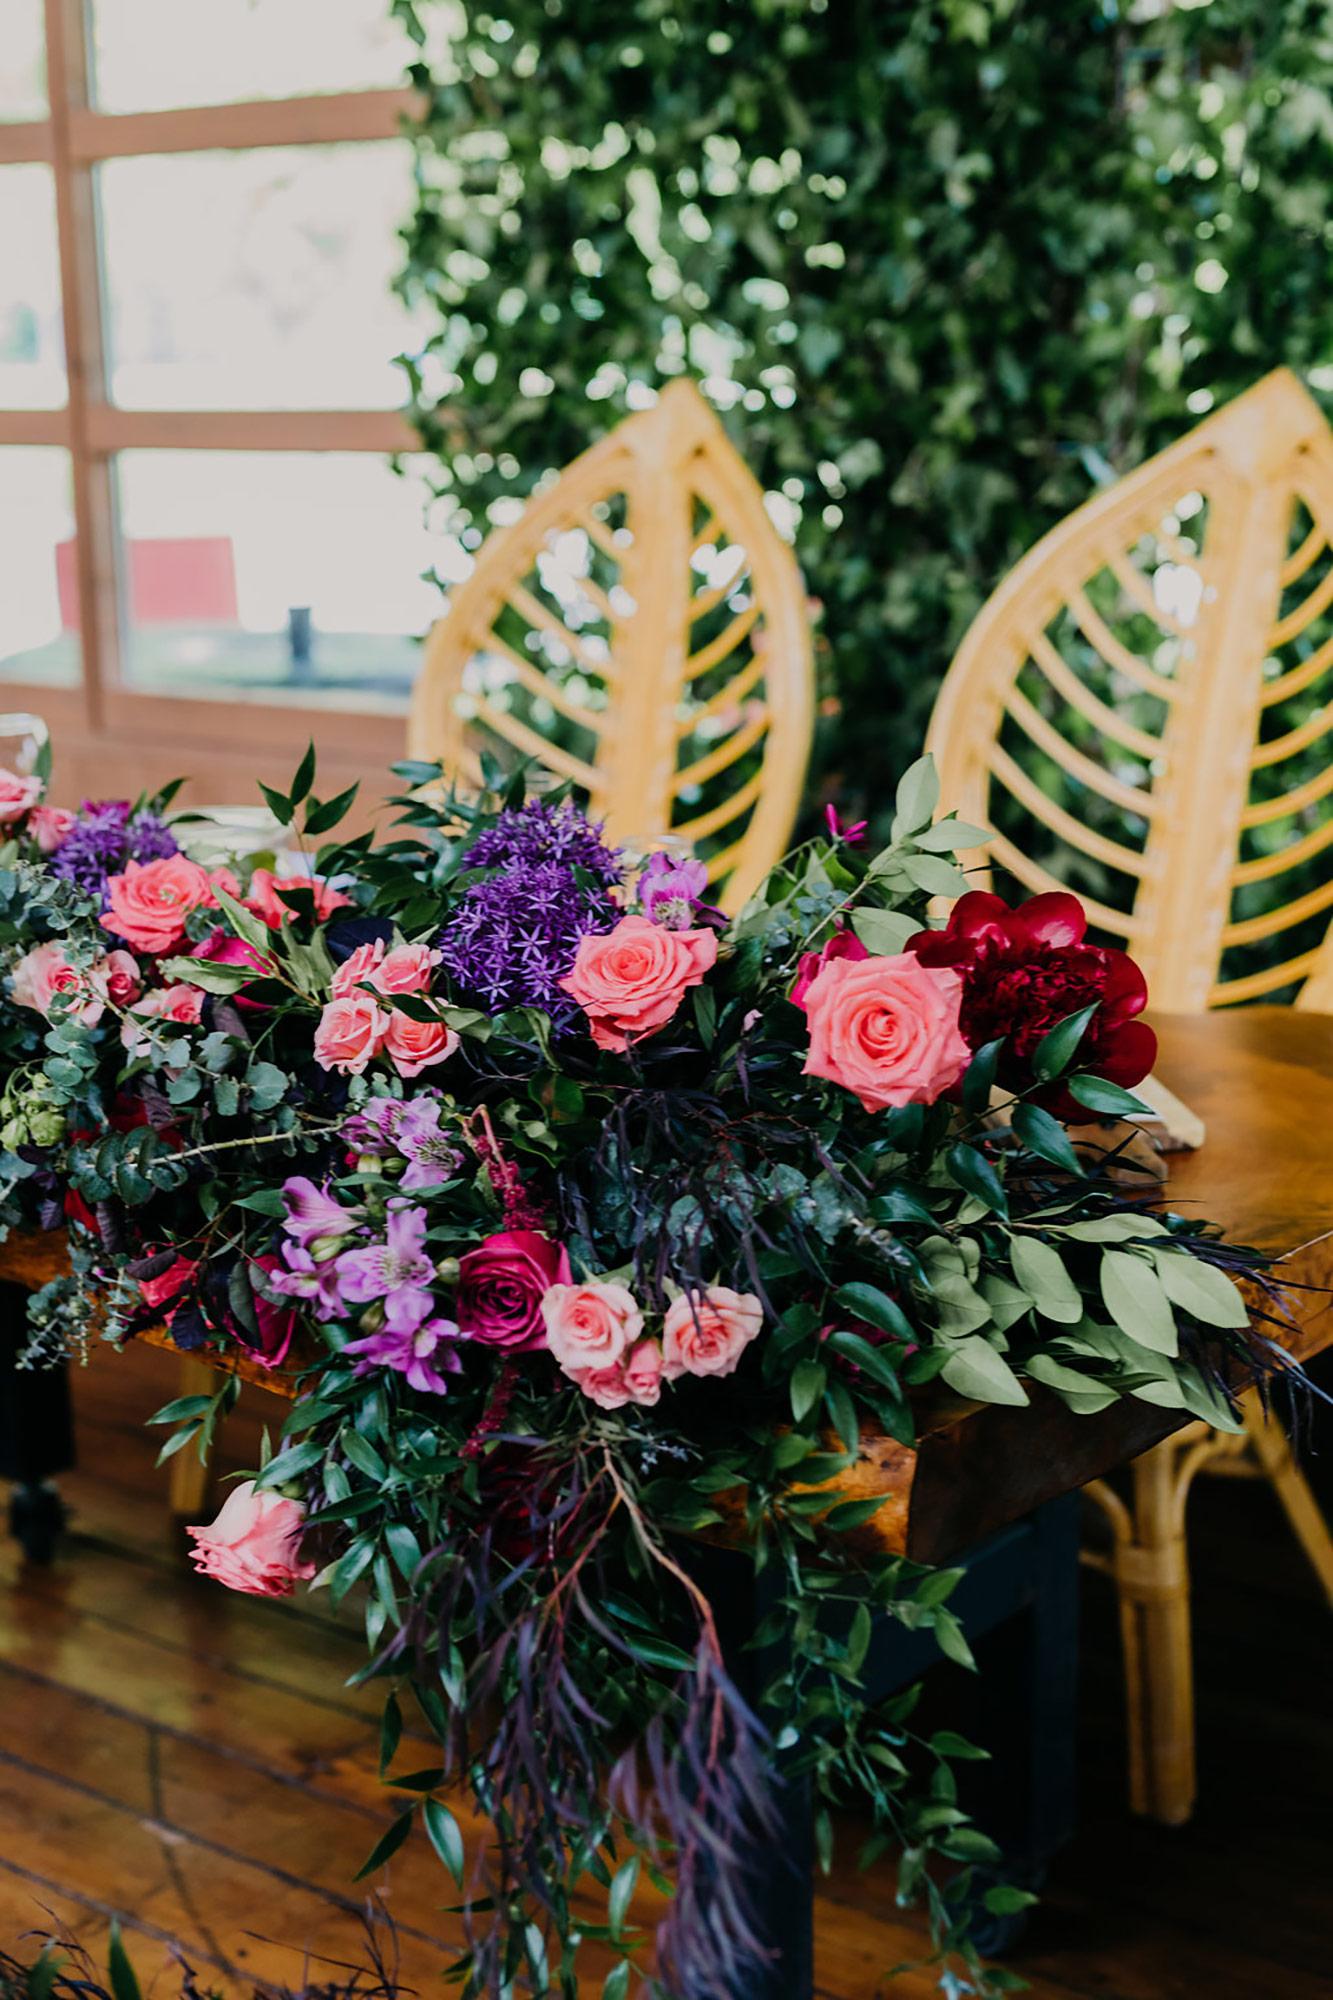 Kurtz-Orchards-Wedding-Niagara-wedding-Vineyard-Bride-Photography-by-Kayla-Rocca-035.JPG